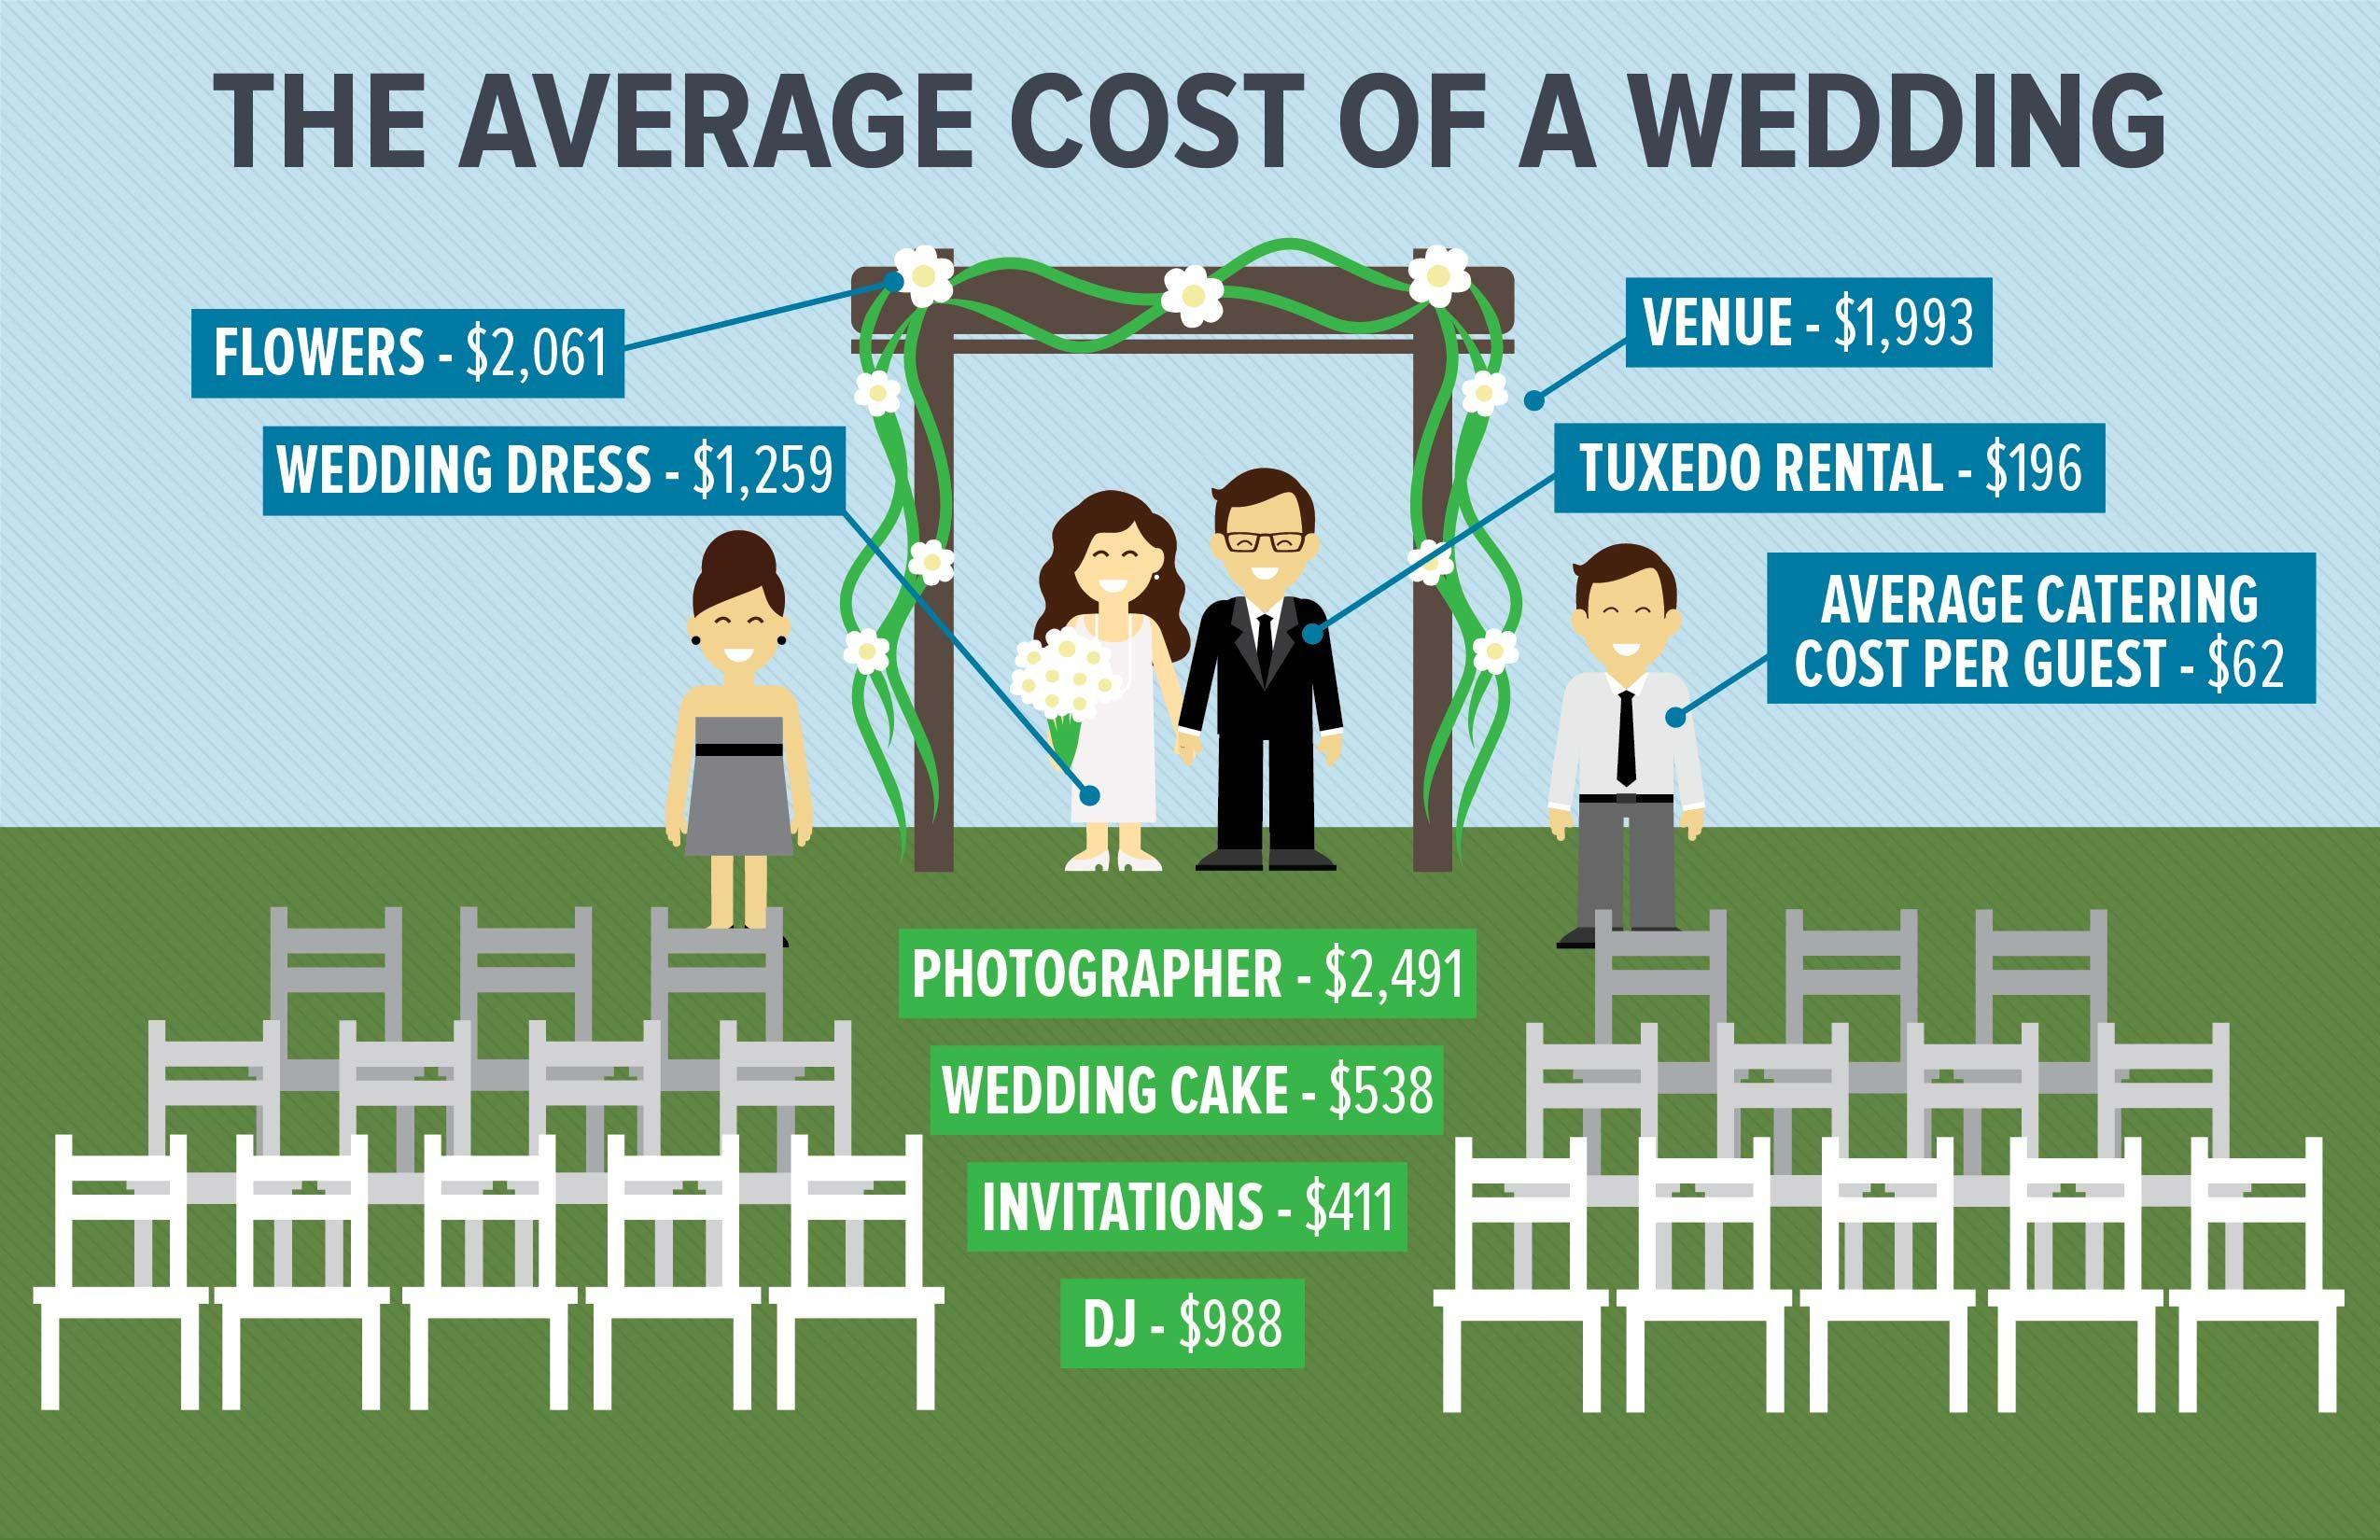 Wedding Dj Tip Amount Wedding dress cost, Wedding dress